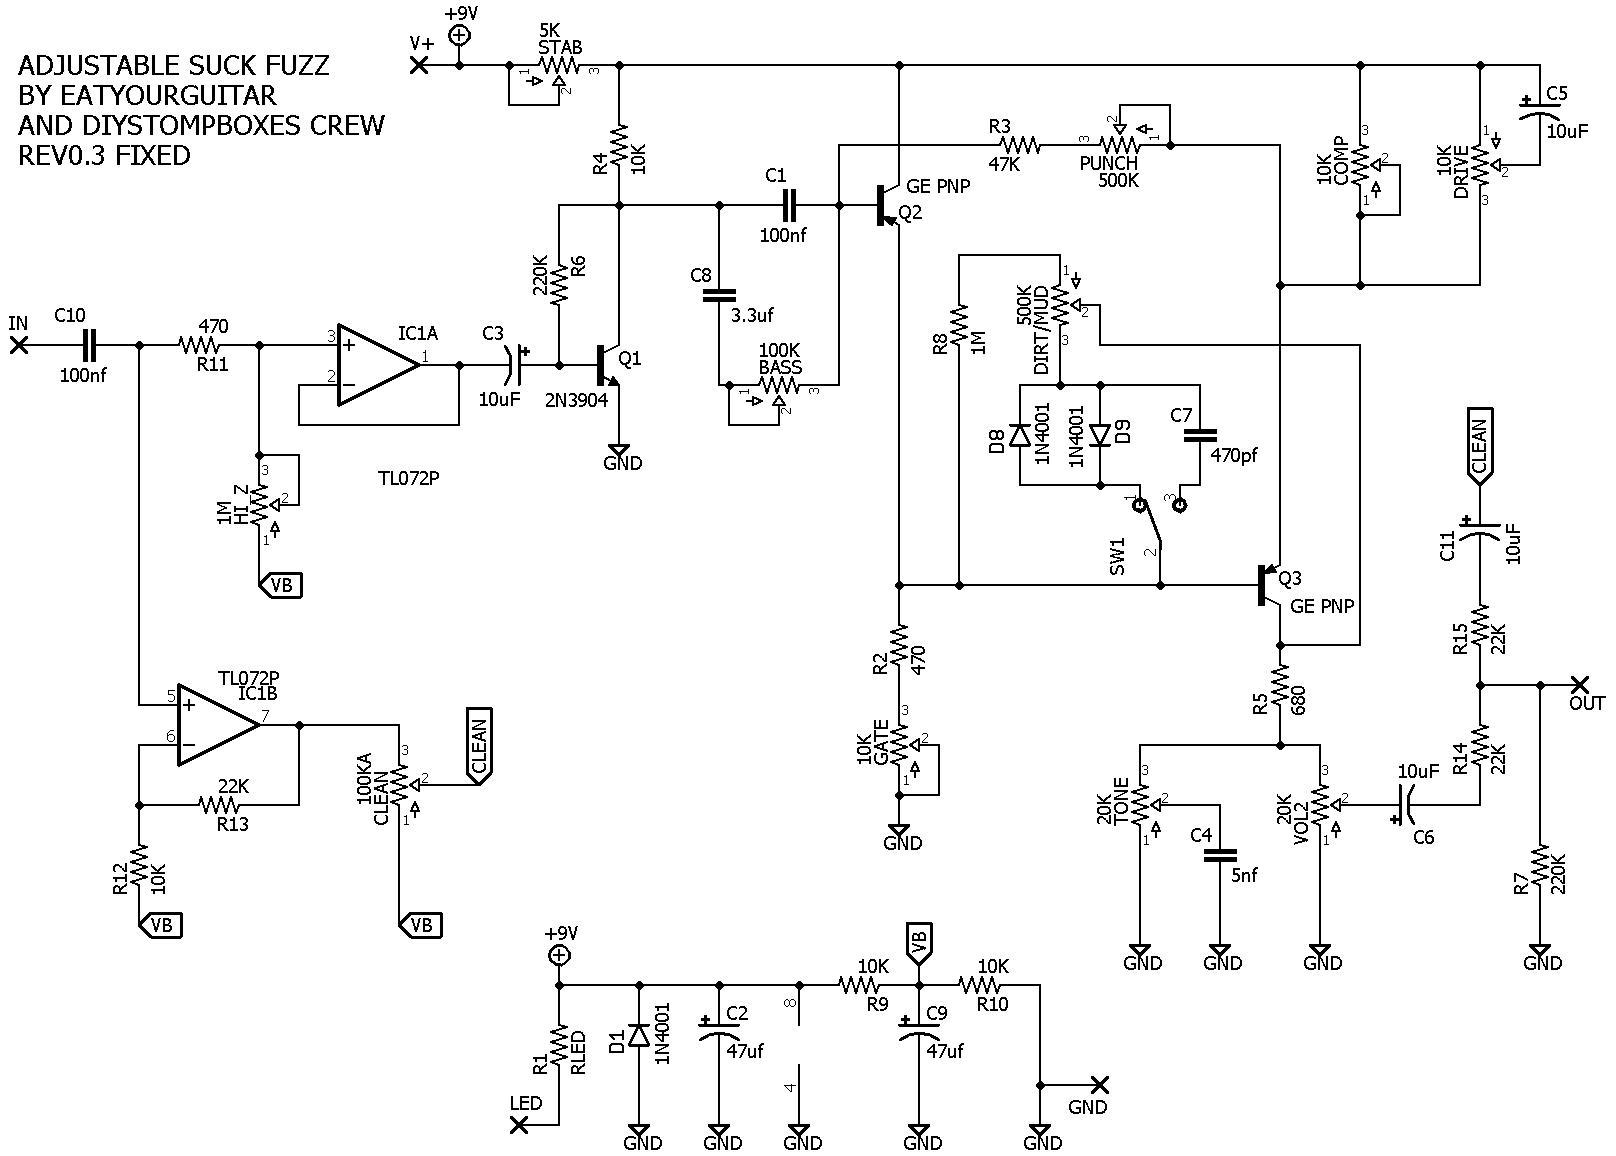 Fuzz Pedal Schematic Pdf - DIY Enthusiasts Wiring Diagrams • on fuzz pedal layout, vibrato pedal schematic, love pedal schematic, bass fuzz schematic, fuzz face schematic, muff fuzz schematic, fuzz pedal capacitor, compressor pedal schematic, fuzz pedal board, sustain pedal schematic, npn fuzz schematic, wah pedal schematic, tone pedal schematic, sam ash fuzz schematic, distortion pedal schematic, keeley fuzz head schematic, tremolo pedal schematic, loop pedal schematic, animal pedal schematic, germanium fuzz schematic,